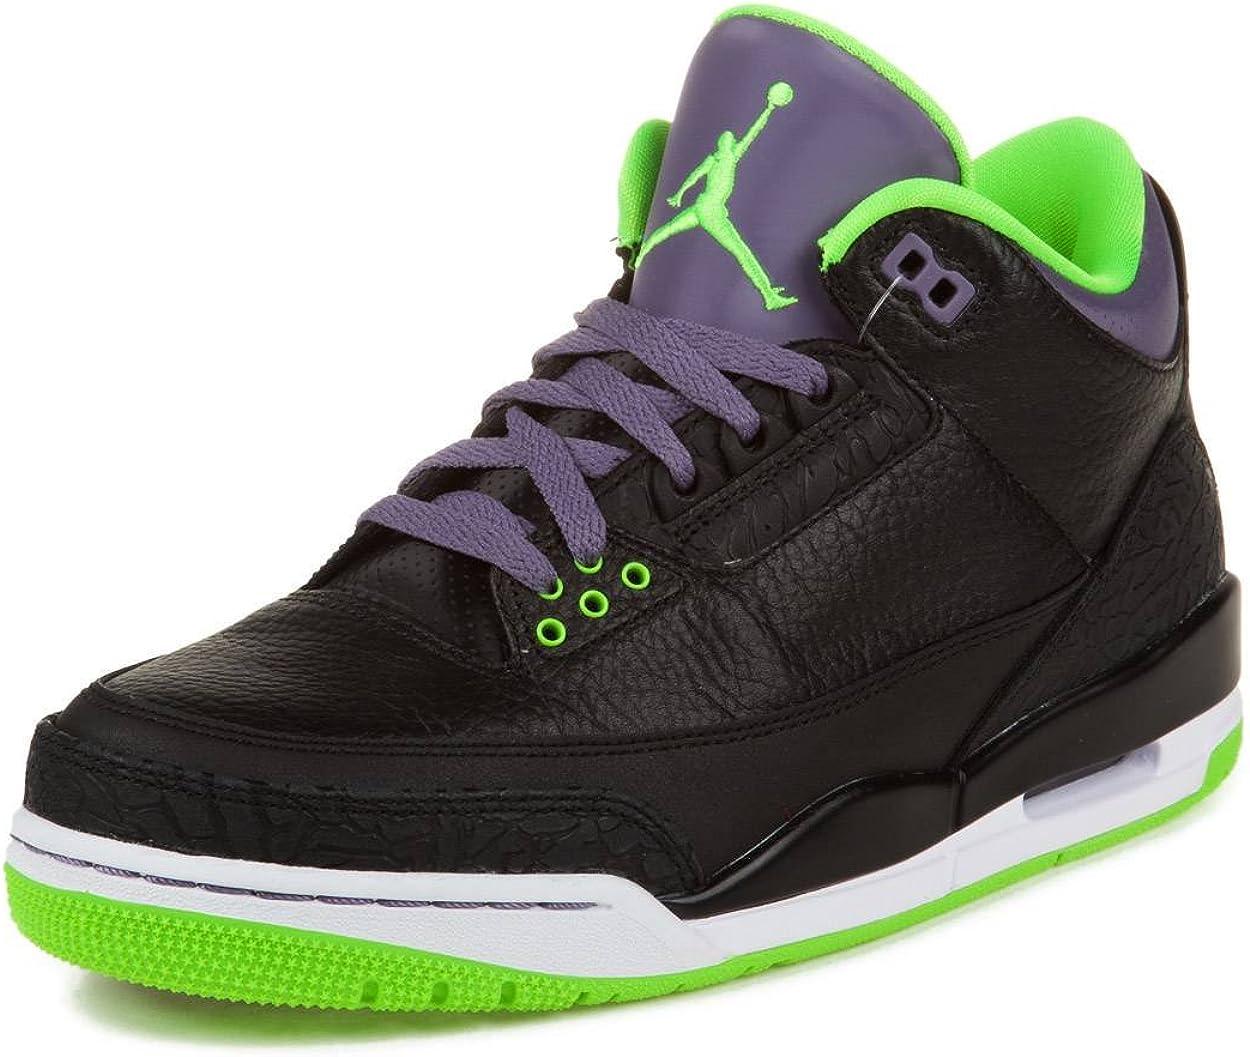 jordan joker shoes